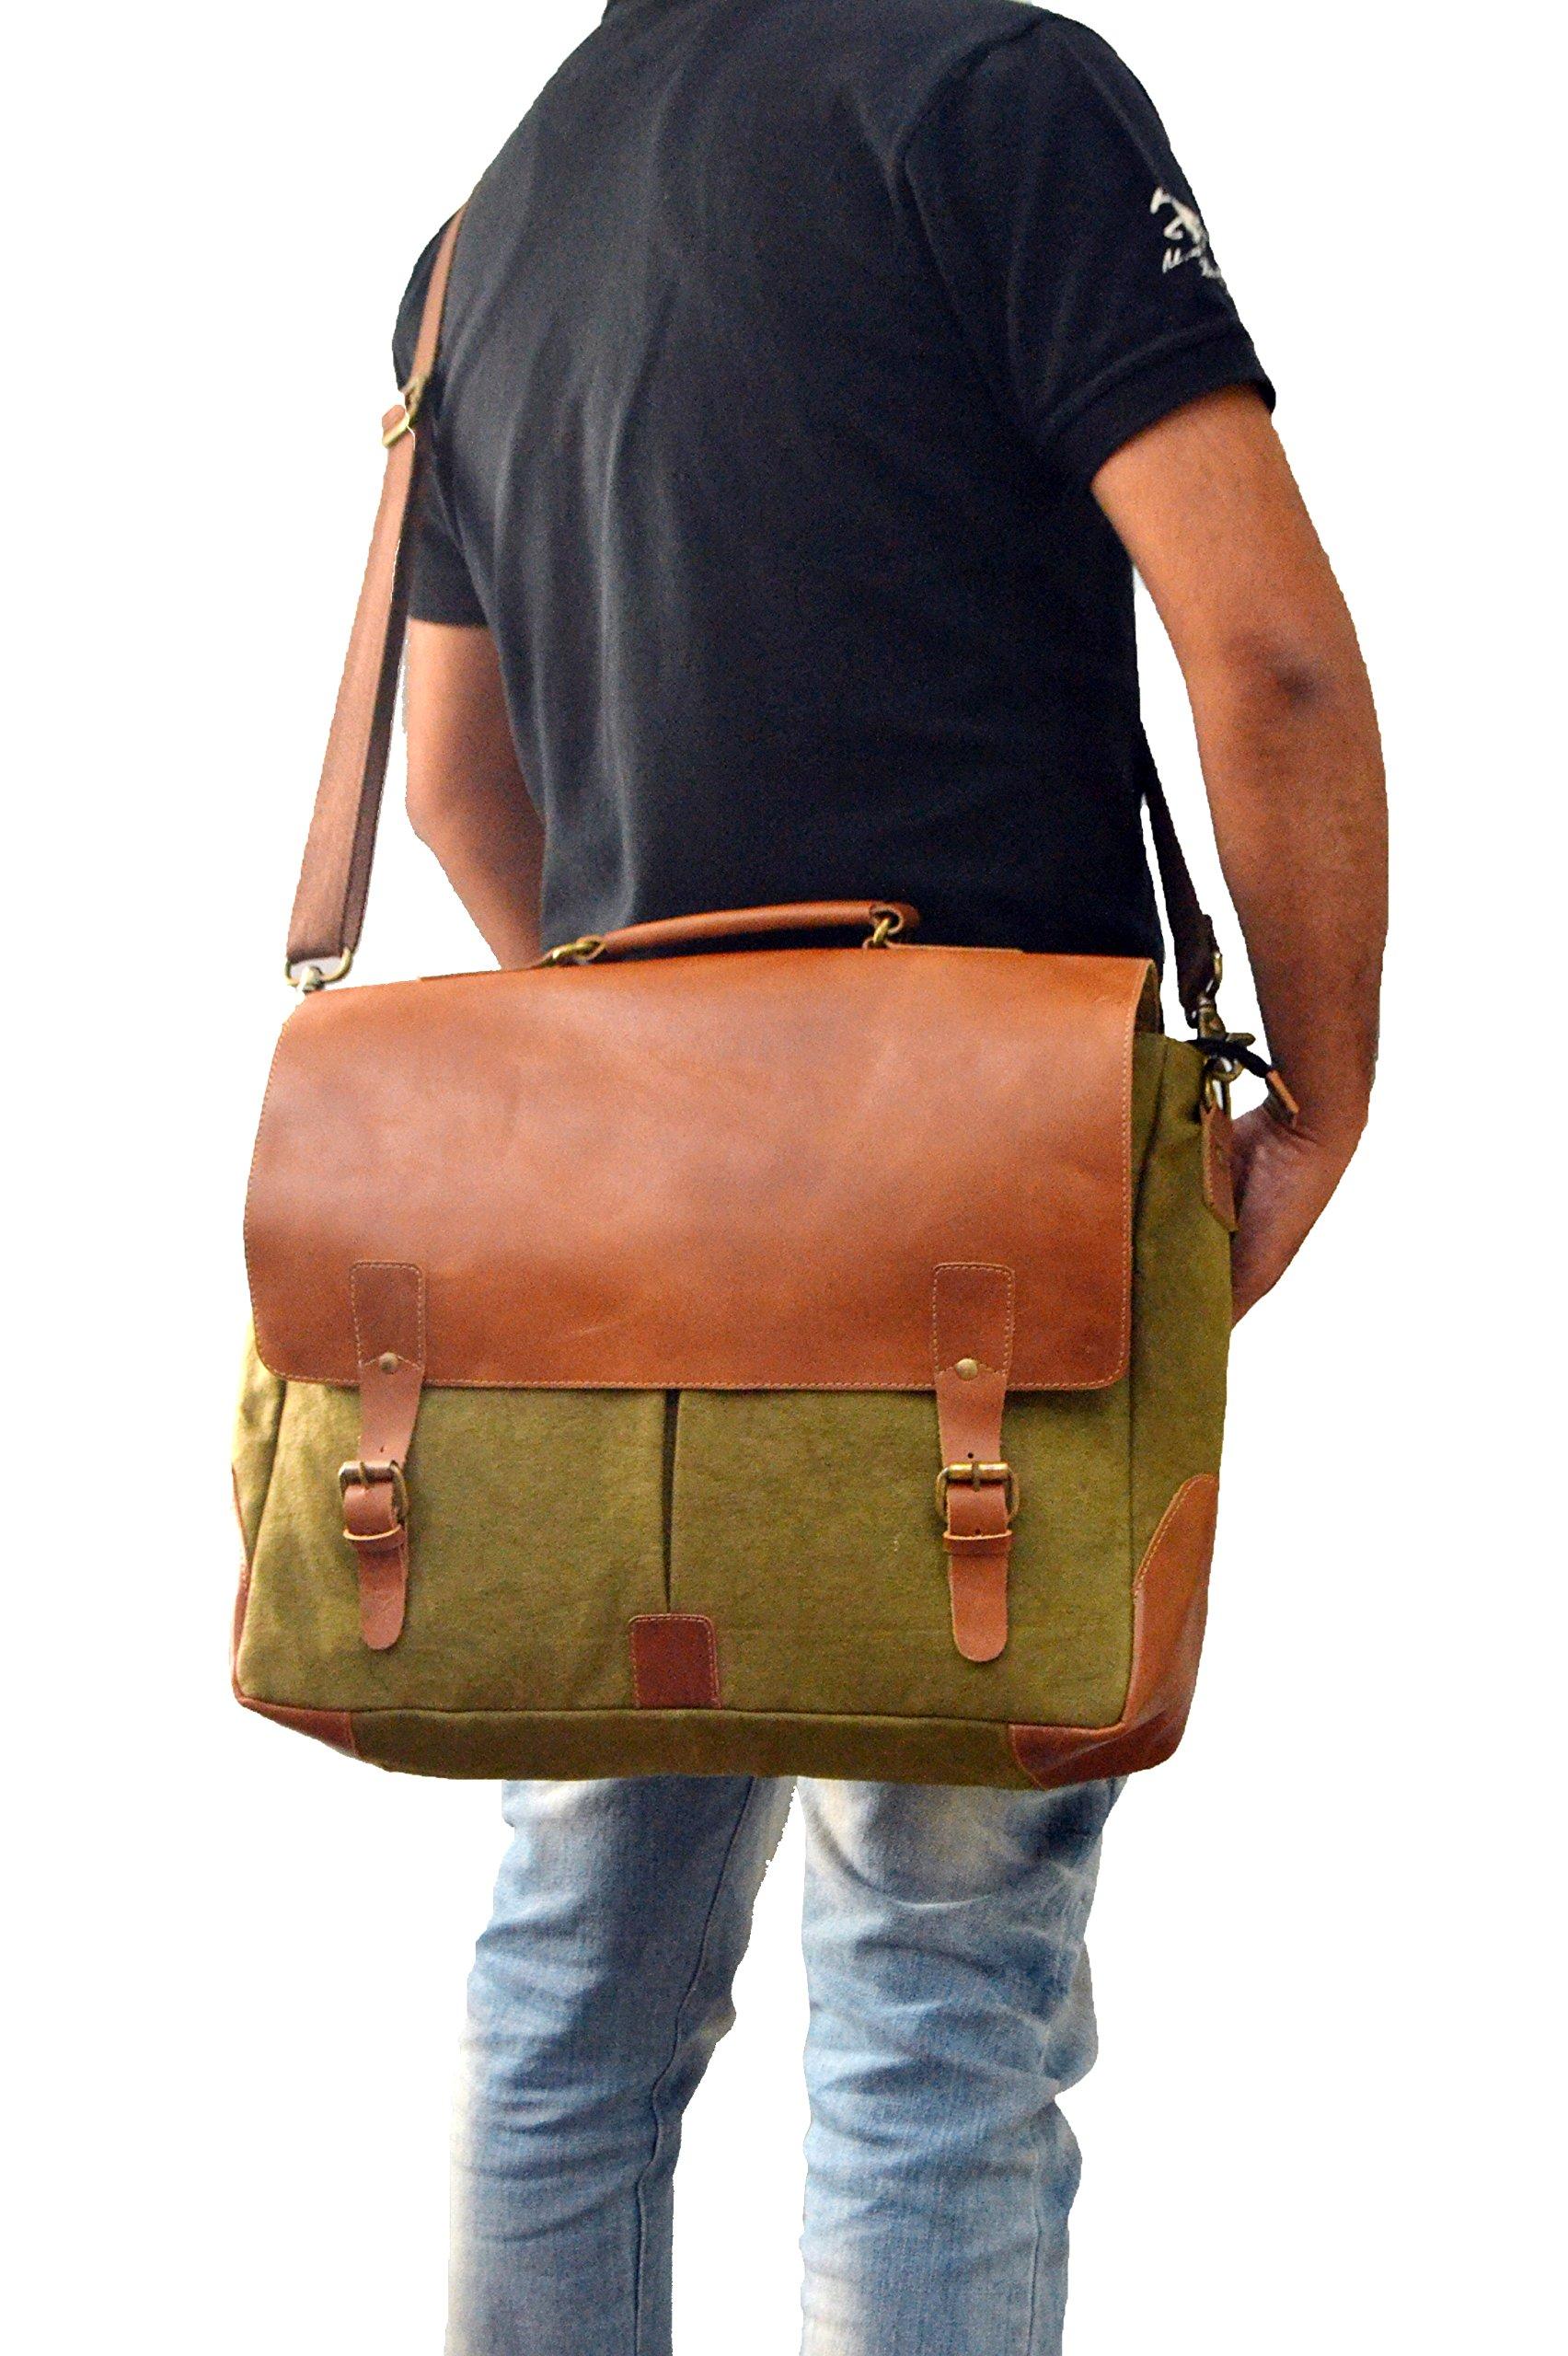 Laptop Messenger & Briefcase 17.3'' Bag, Office Bag for Men/Womens Shoulder Bag fit for Macbook/Dell/Hp/Lenovo/Acer/Asus Laptop (17.3 inch, Army Green)